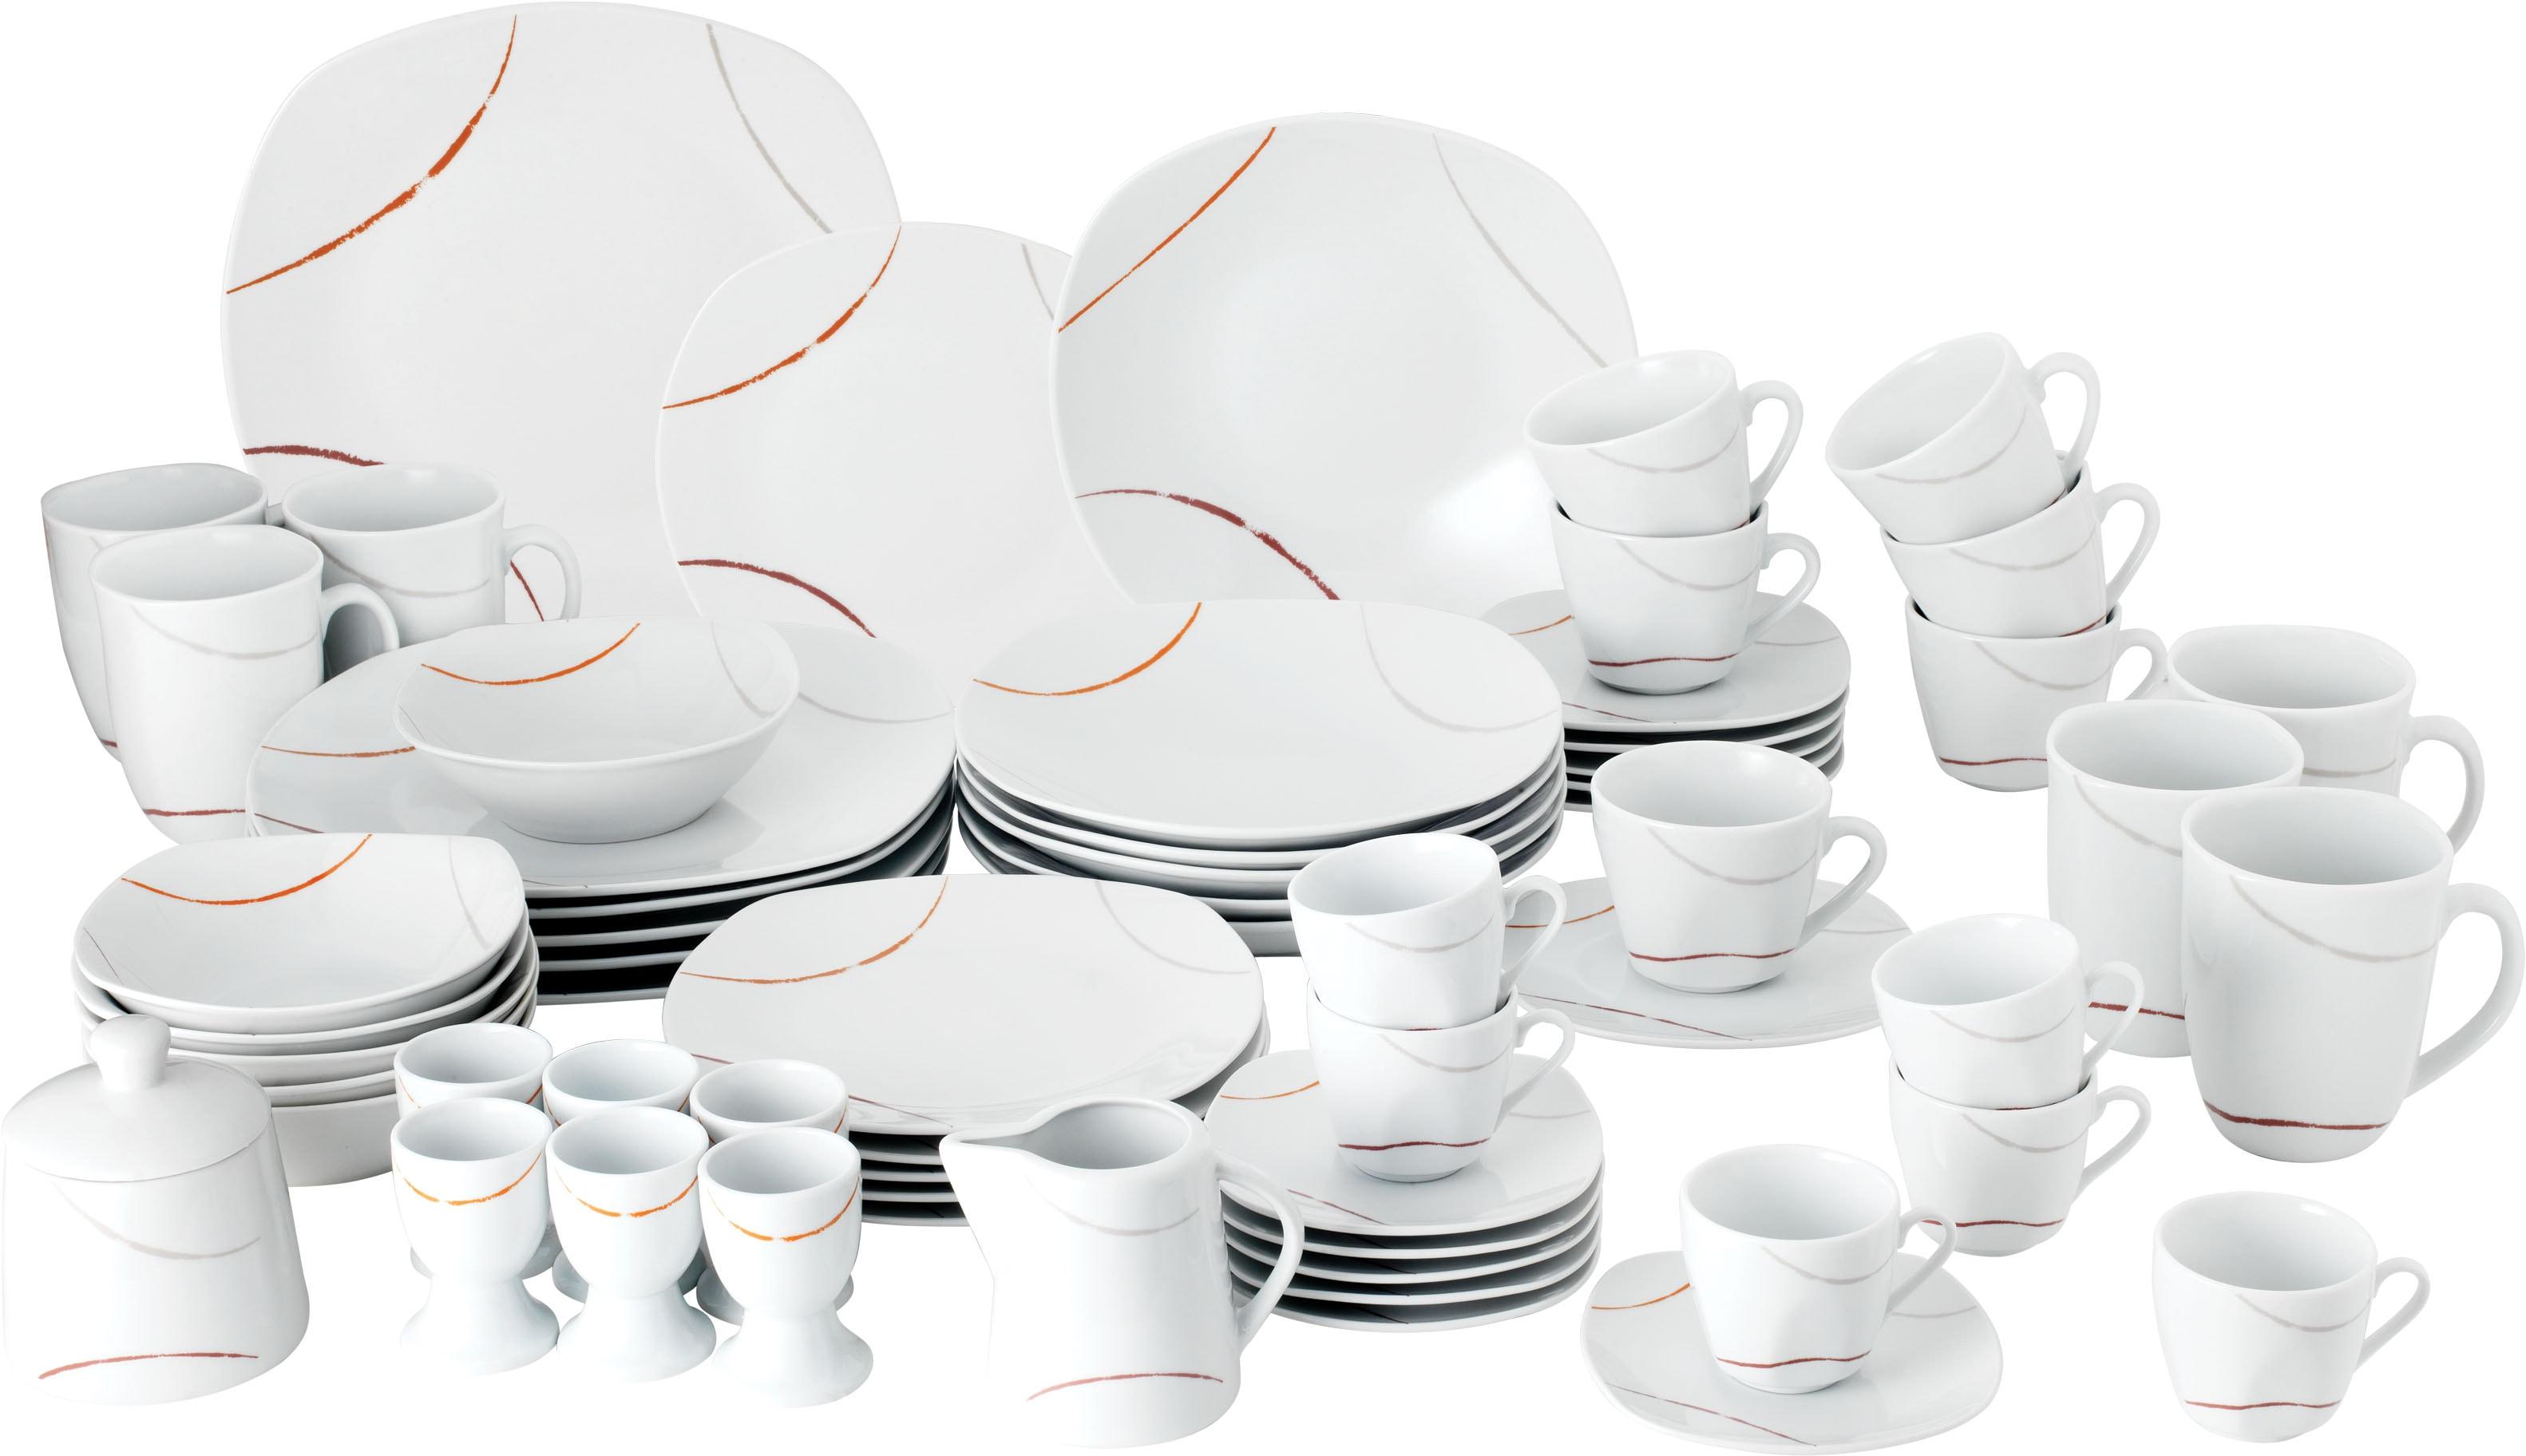 van Well Geschirr-Set Porto, (Set, 62 tlg.), Eckige Form weiß Geschirr-Sets Geschirr, Porzellan Tischaccessoires Haushaltswaren